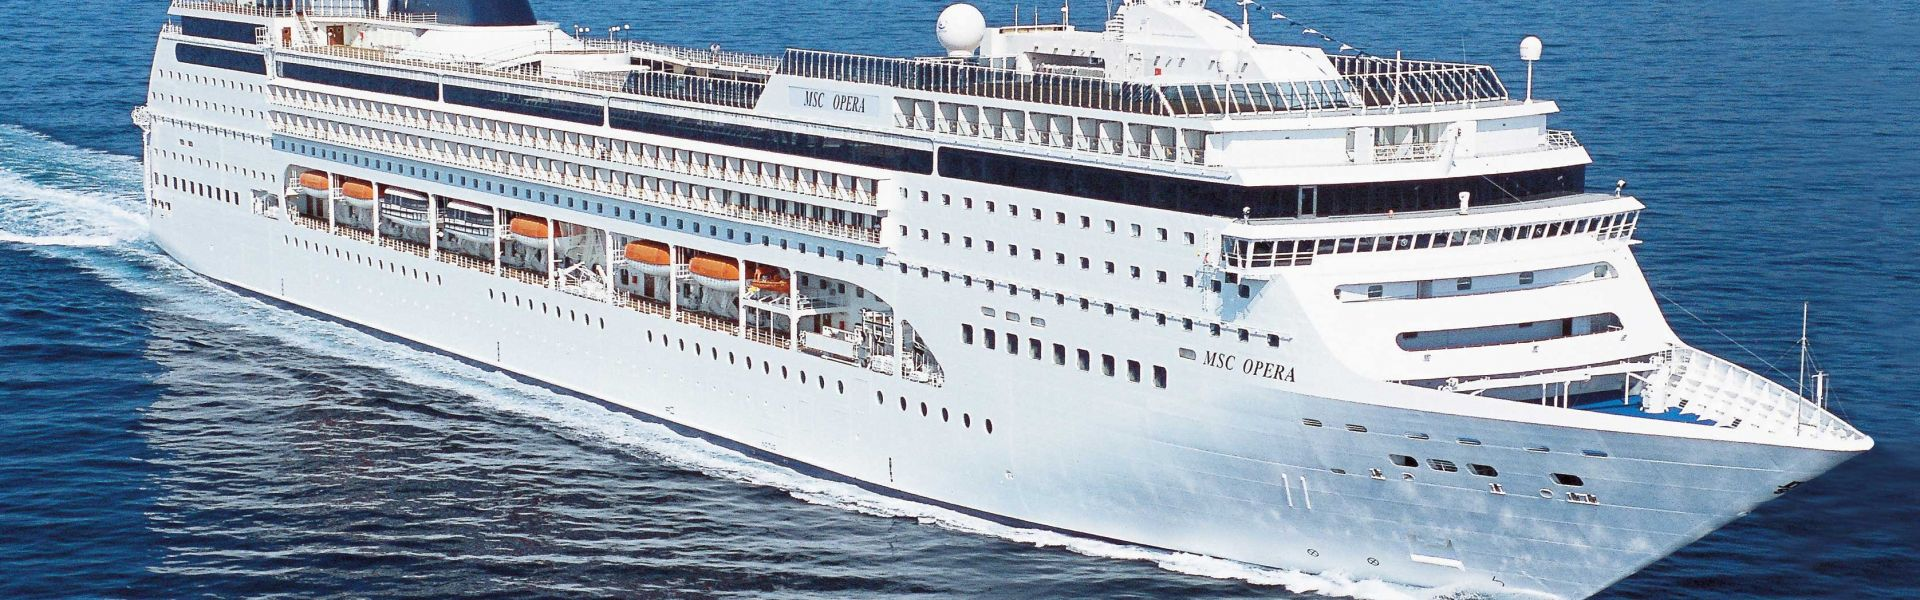 Croaziera 2018 - Mediterana de Vest (Genova) - MSC Cruises - MSC Opera - 7 nopti